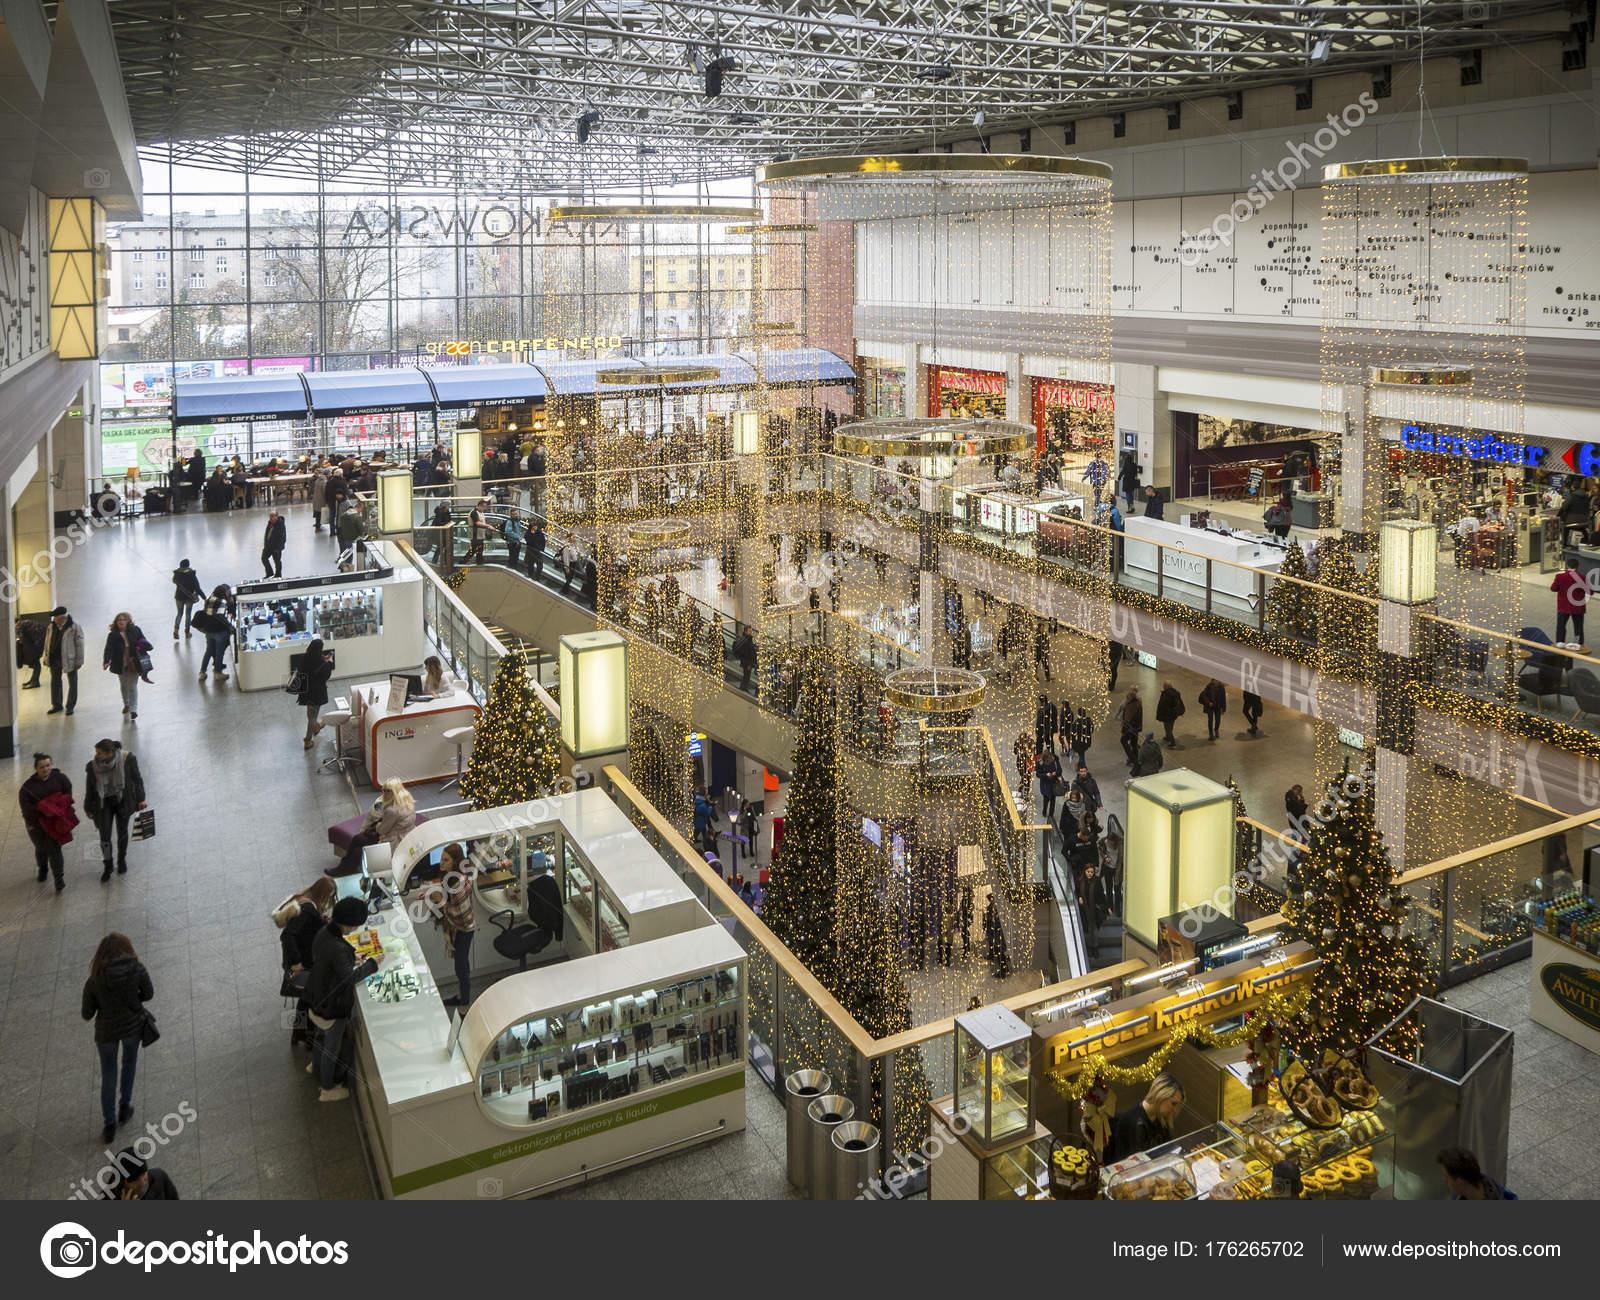 Adornos navide os y compras en un hipermercado en cracovia for Adornos navidenos 2017 trackid sp 006